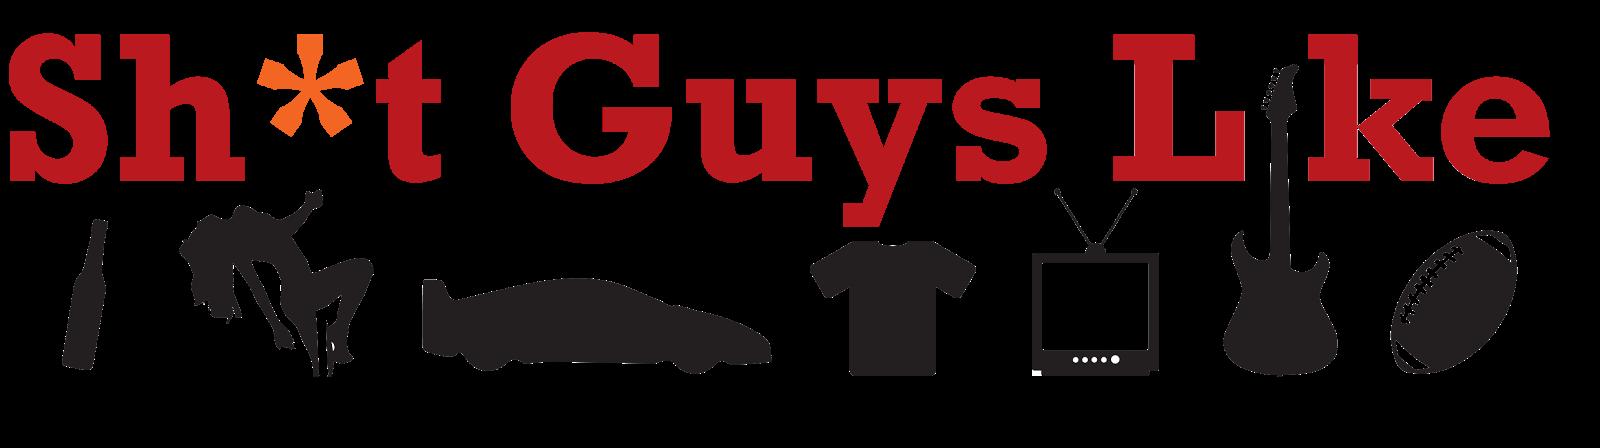 Sh*t Guys Like